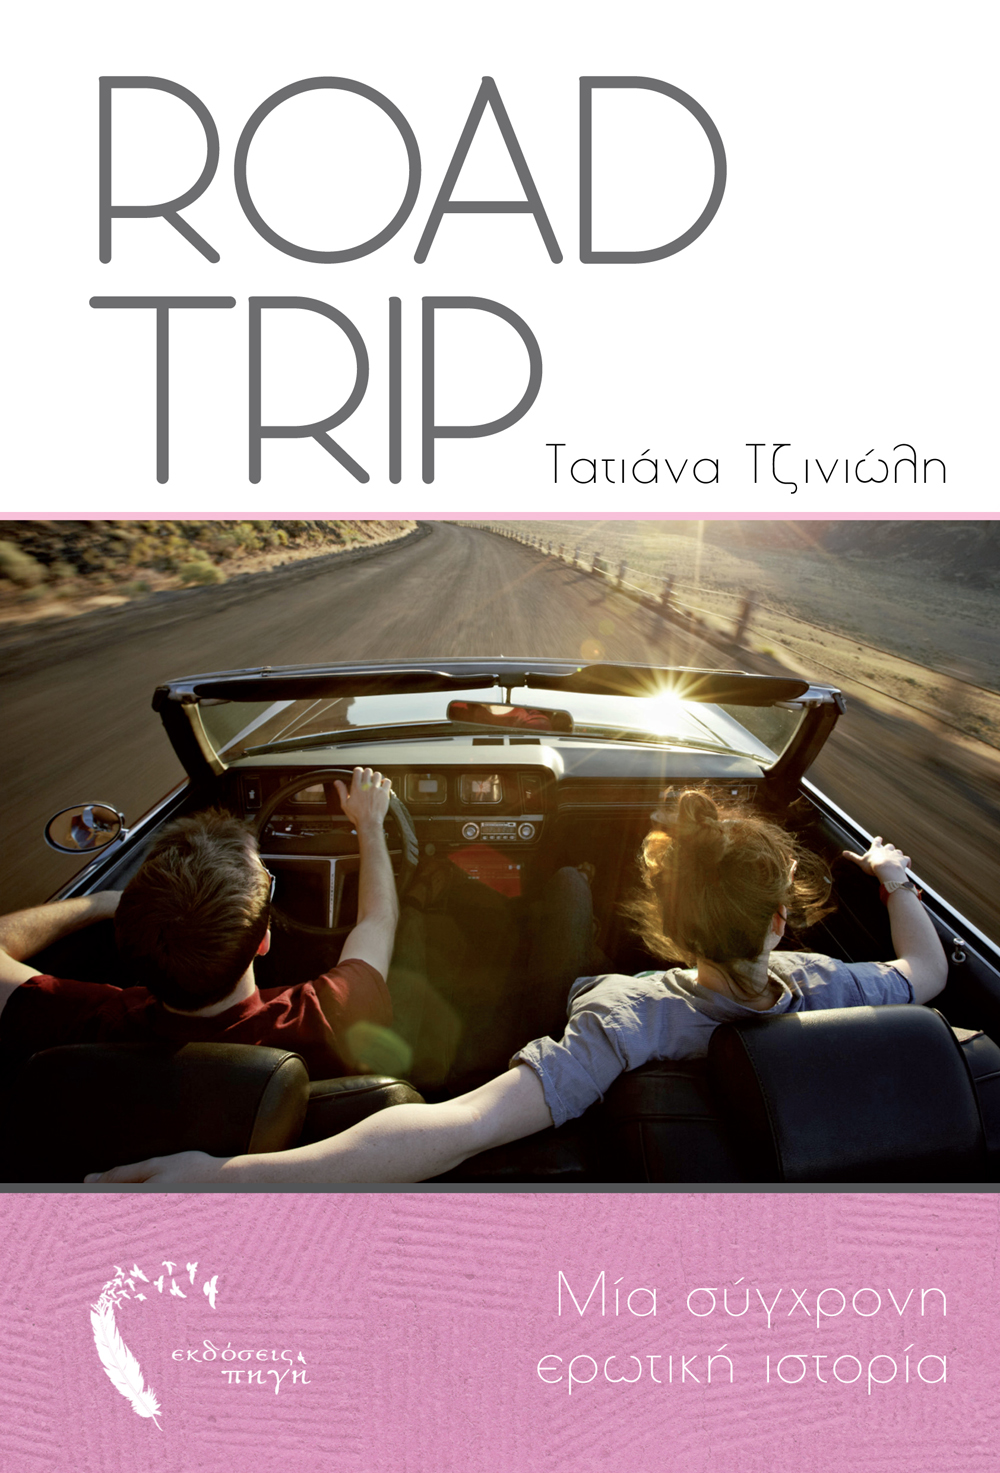 Road Trip, Τατιάνα Τζινιώλη, Εκδόσεις Πηγή - www.pigi.gr